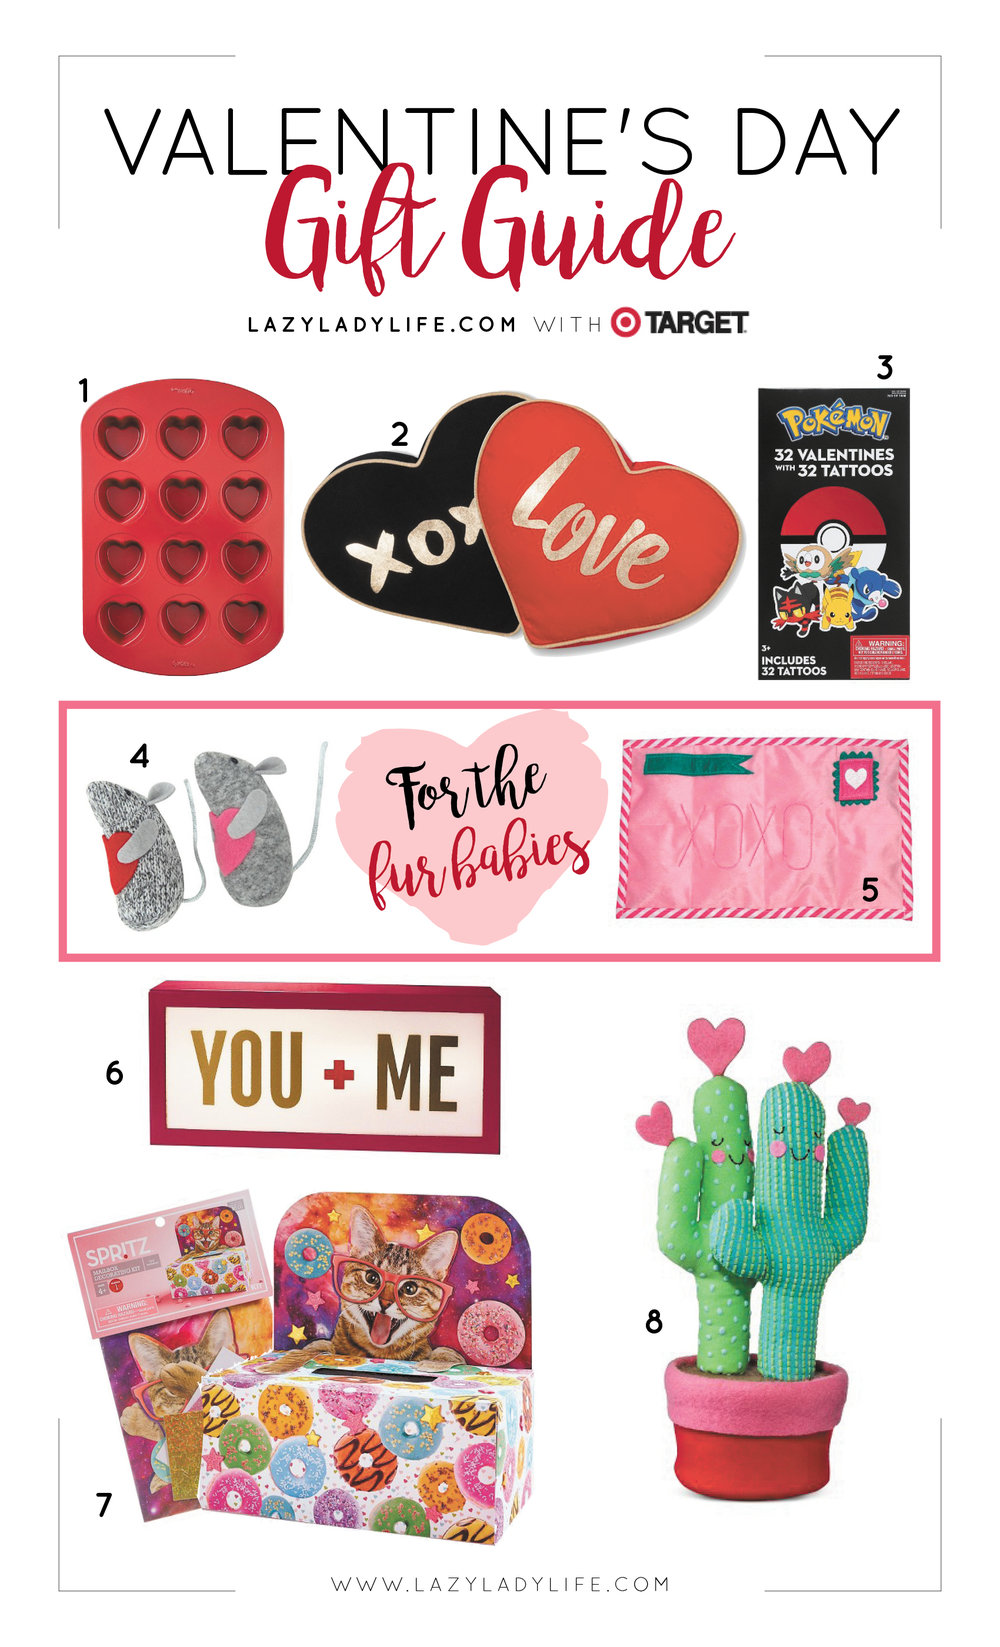 VALENTINE-Gift-Guide-LazyLadyLife.jpg